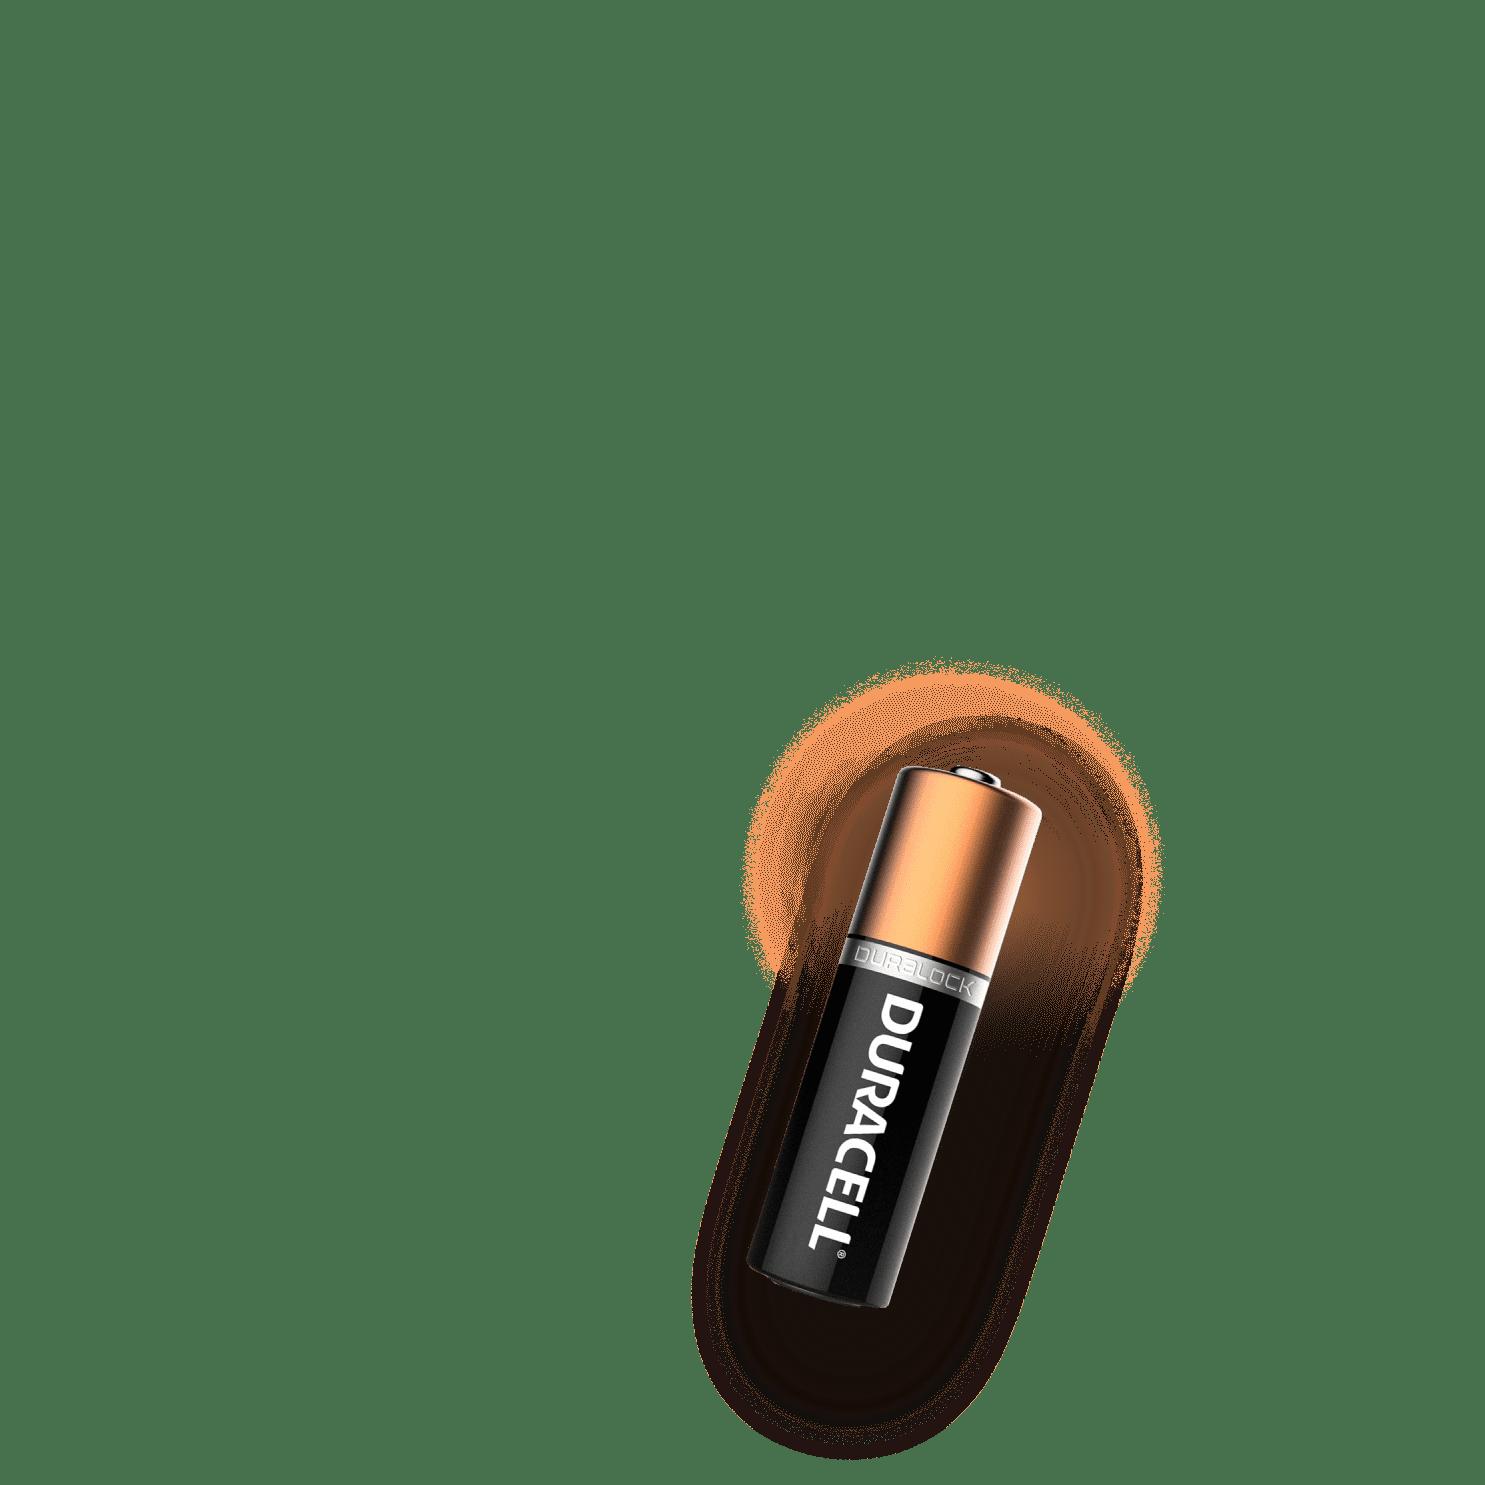 duracell battery branding